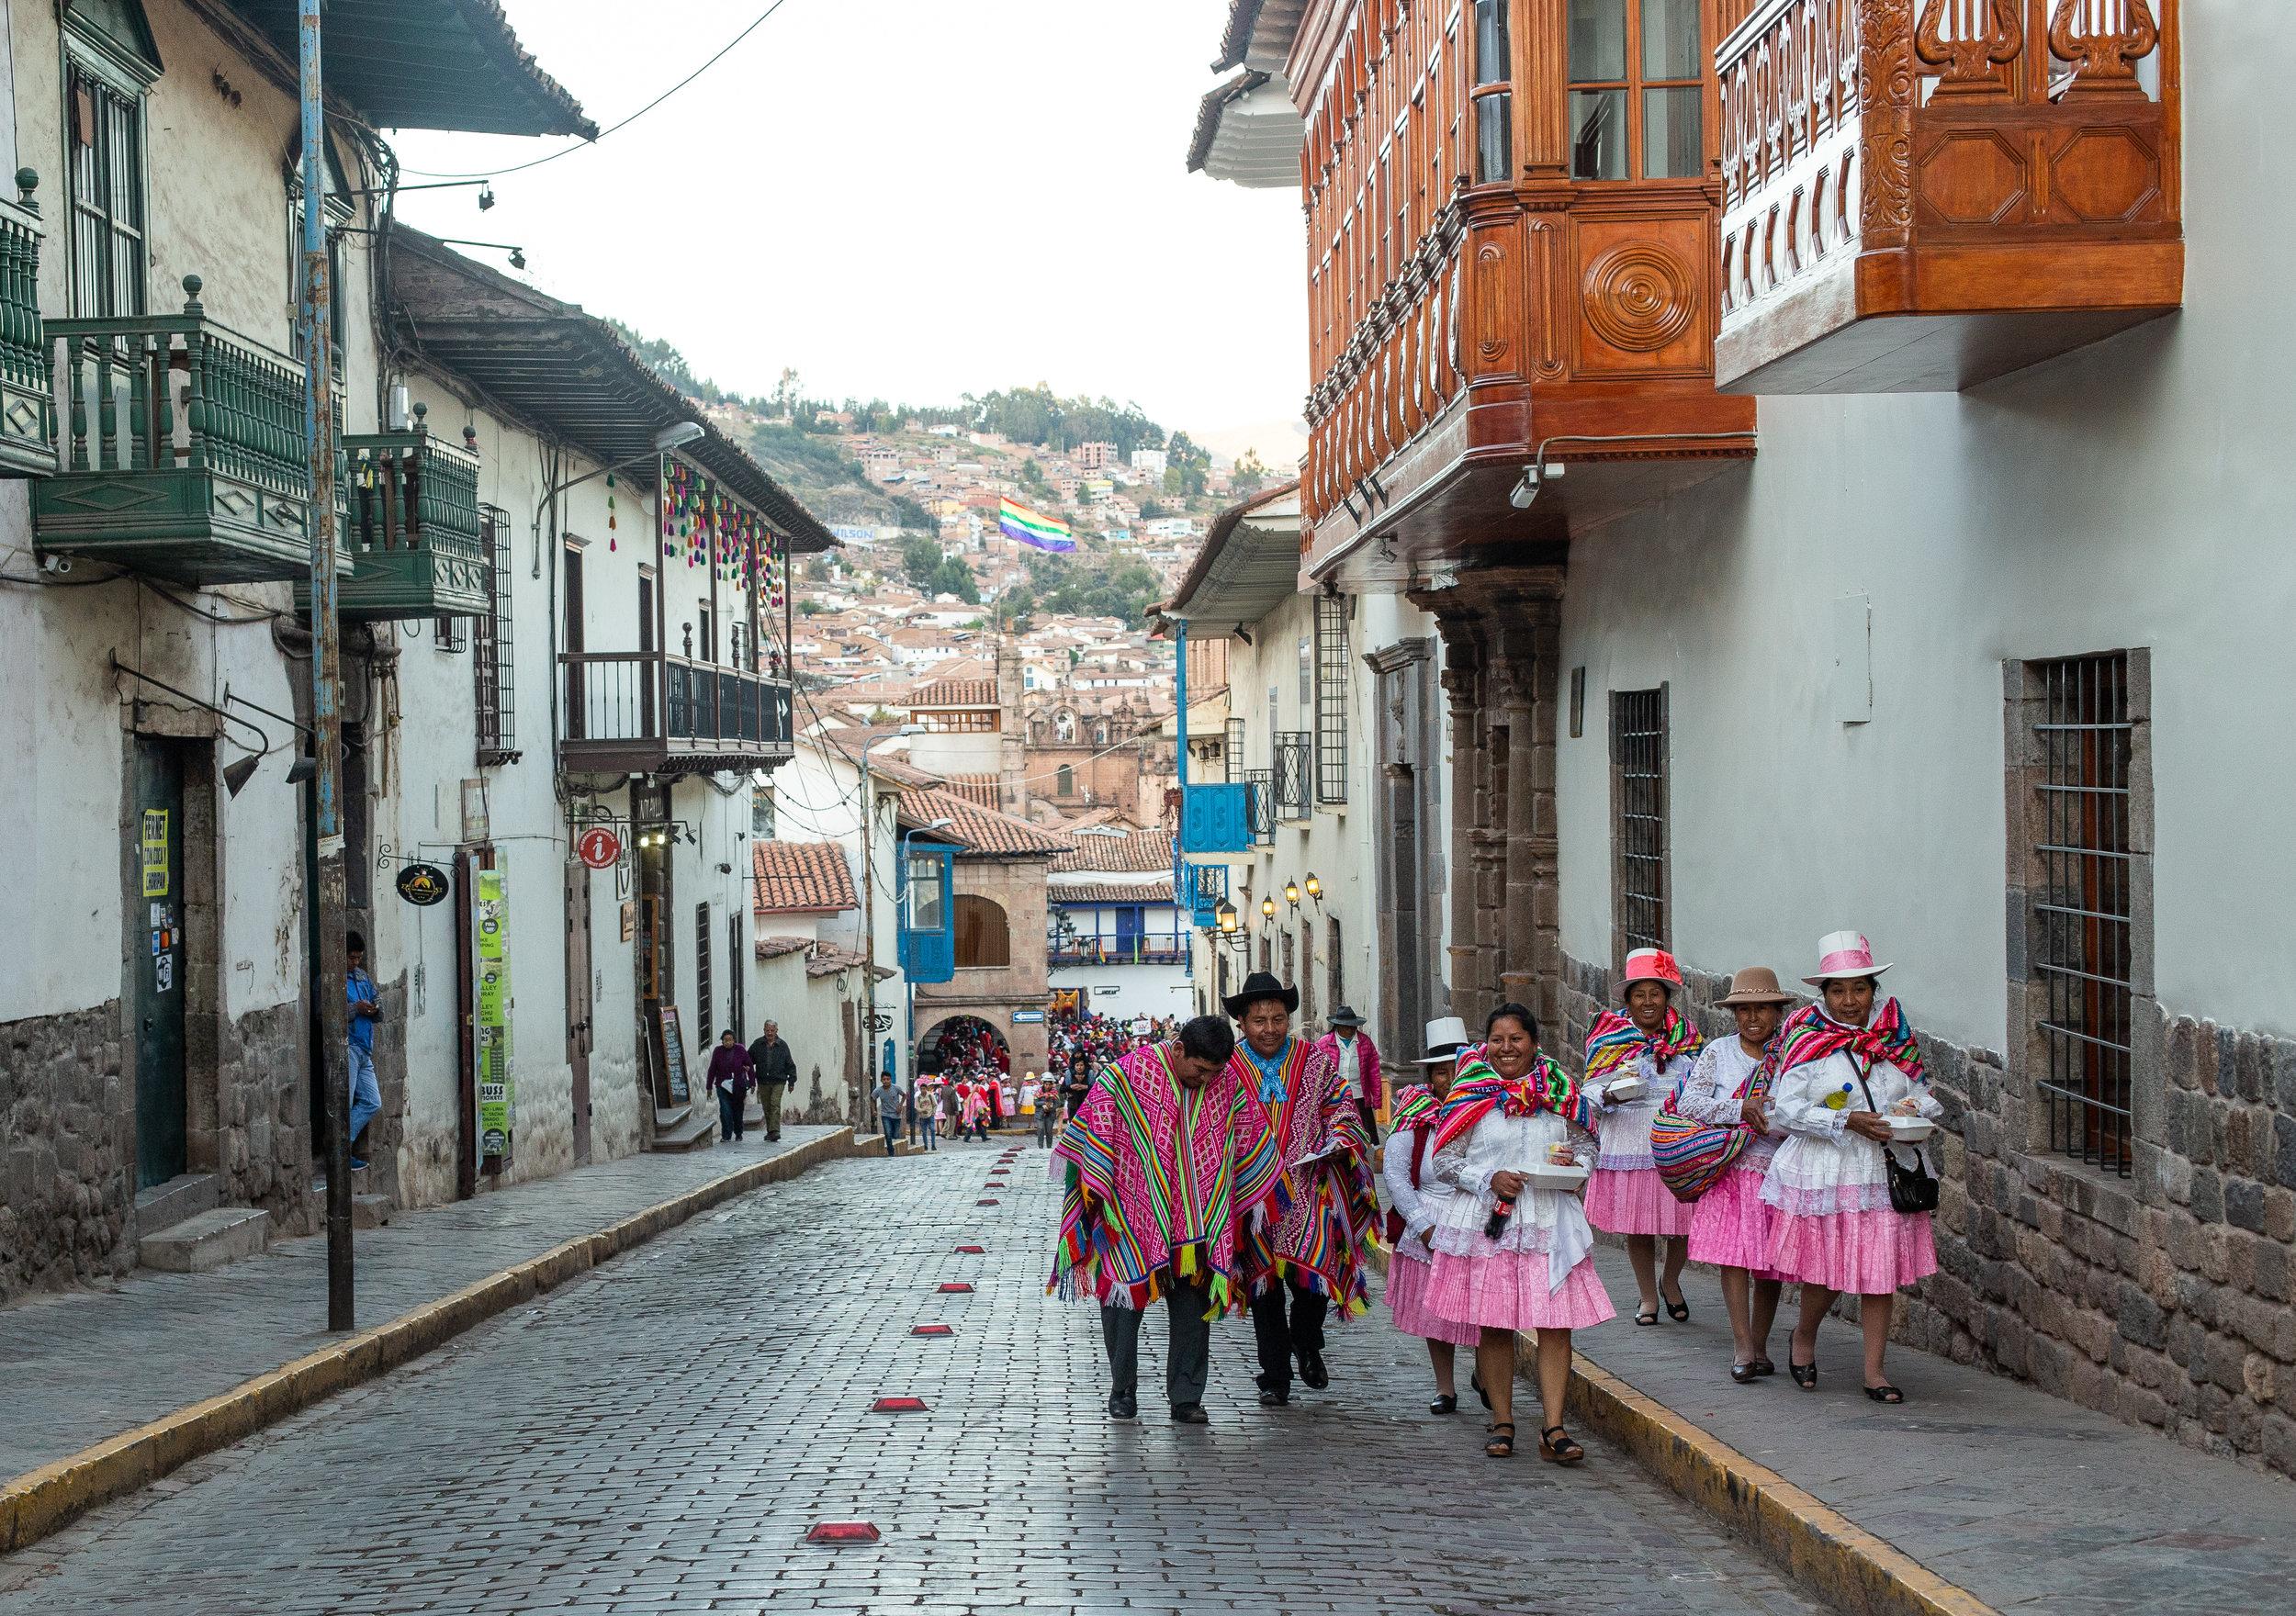 Post Parade - Cusco